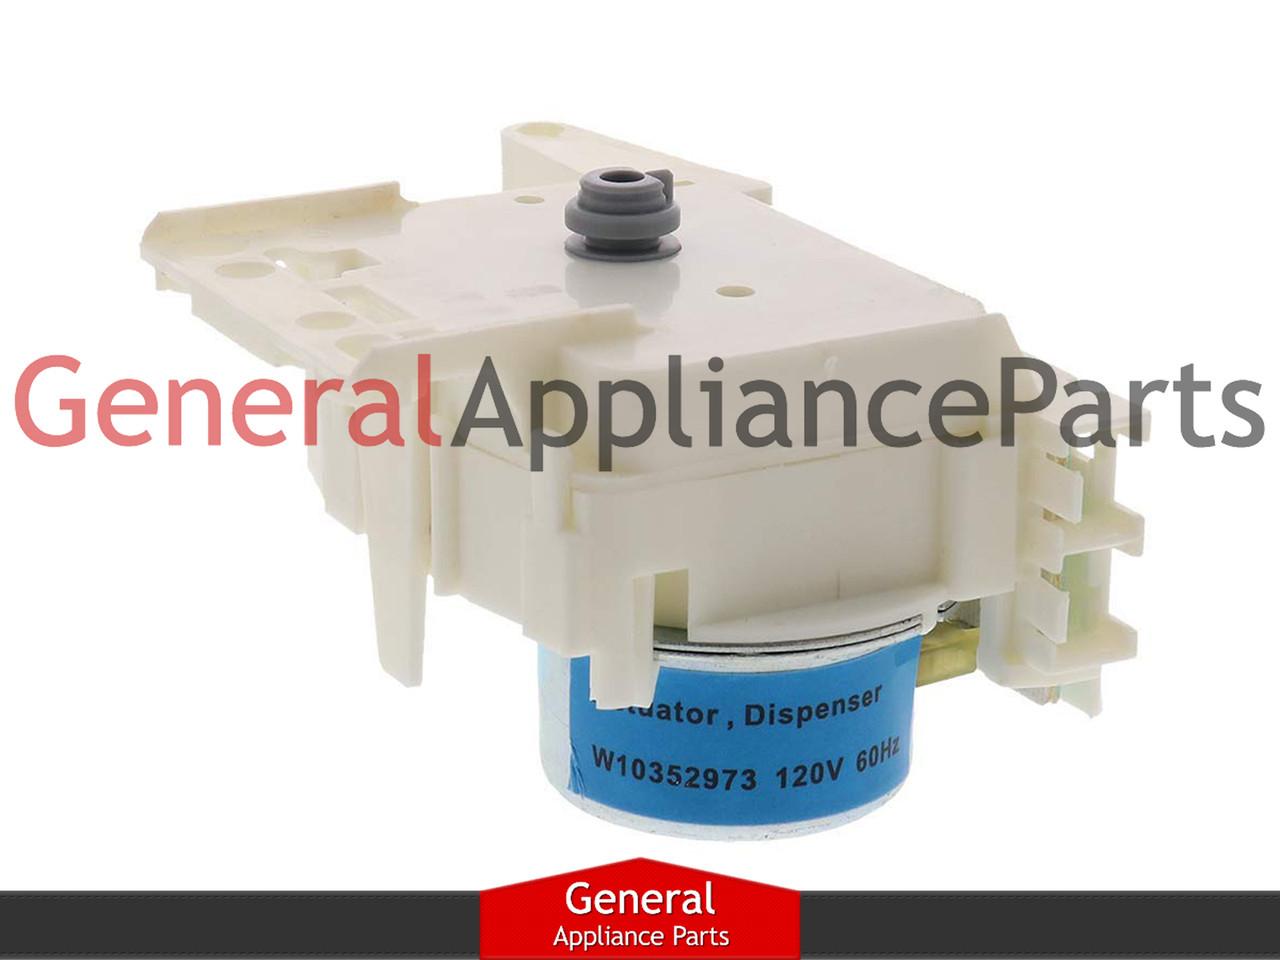 Whirlpool Kenmore Sears Washing Machine Dispenser Actuator W10352973 8183186